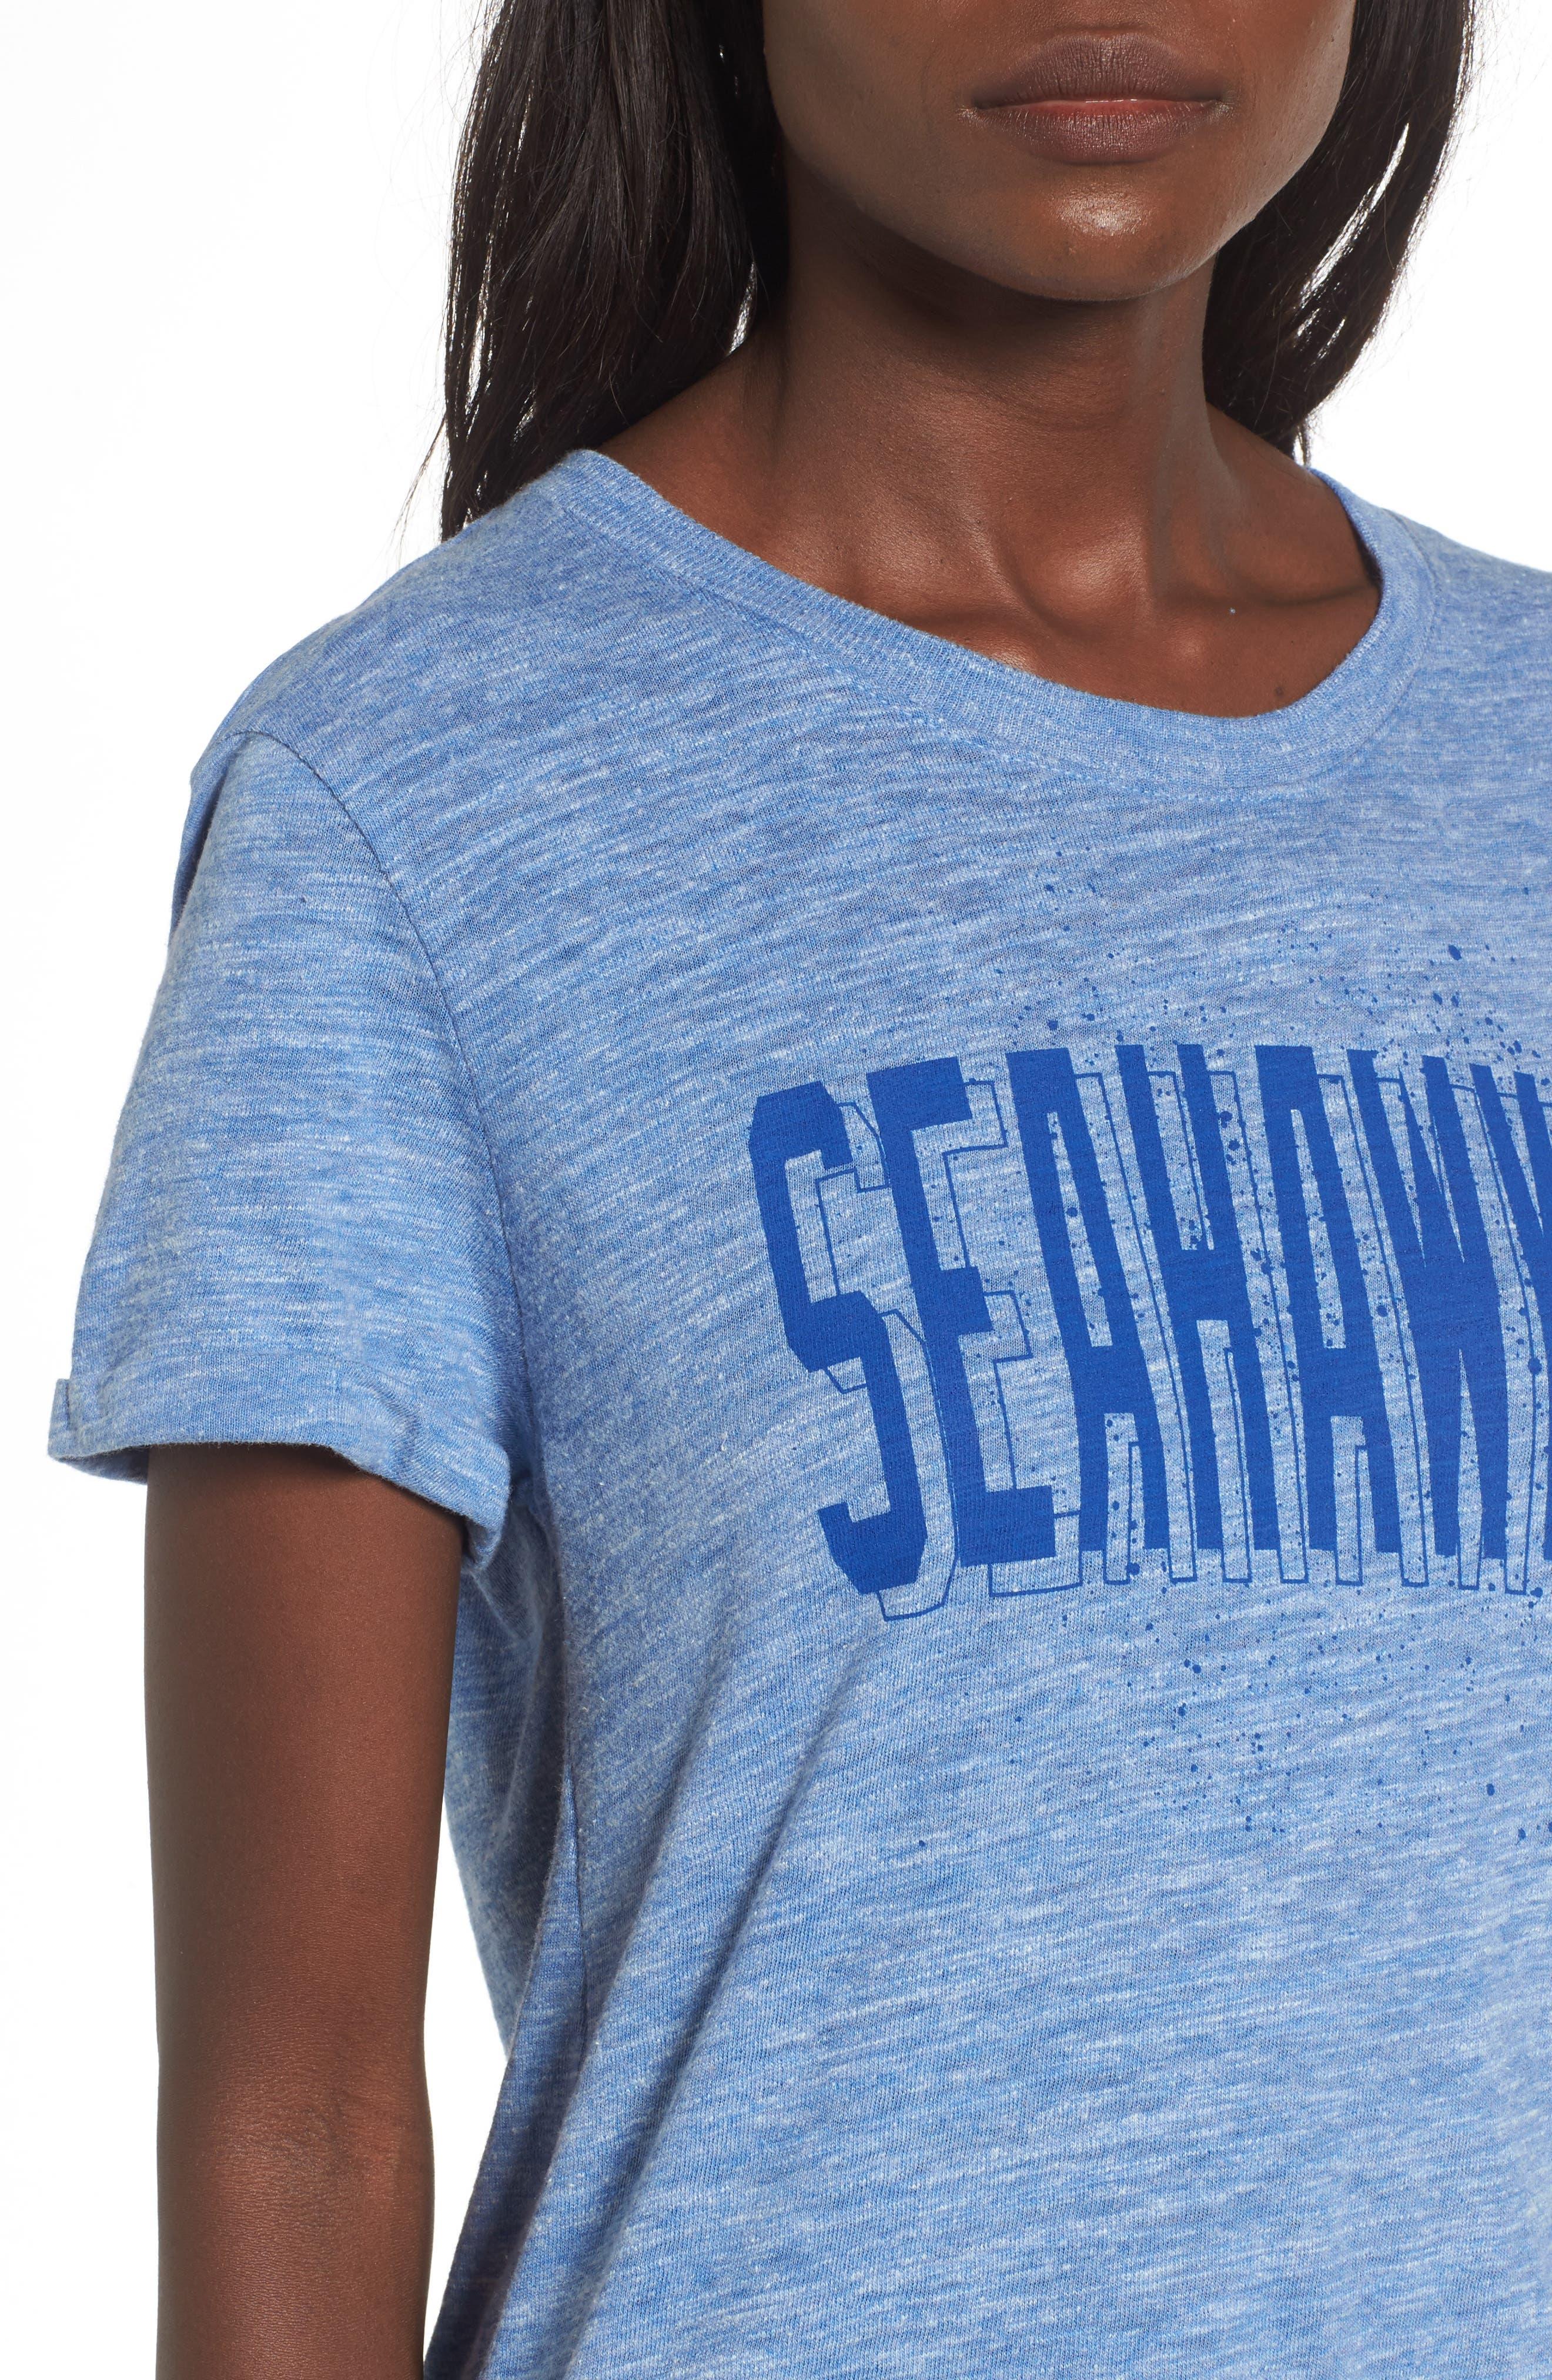 MVP Hero - Seahawks Tee,                             Alternate thumbnail 4, color,                             400